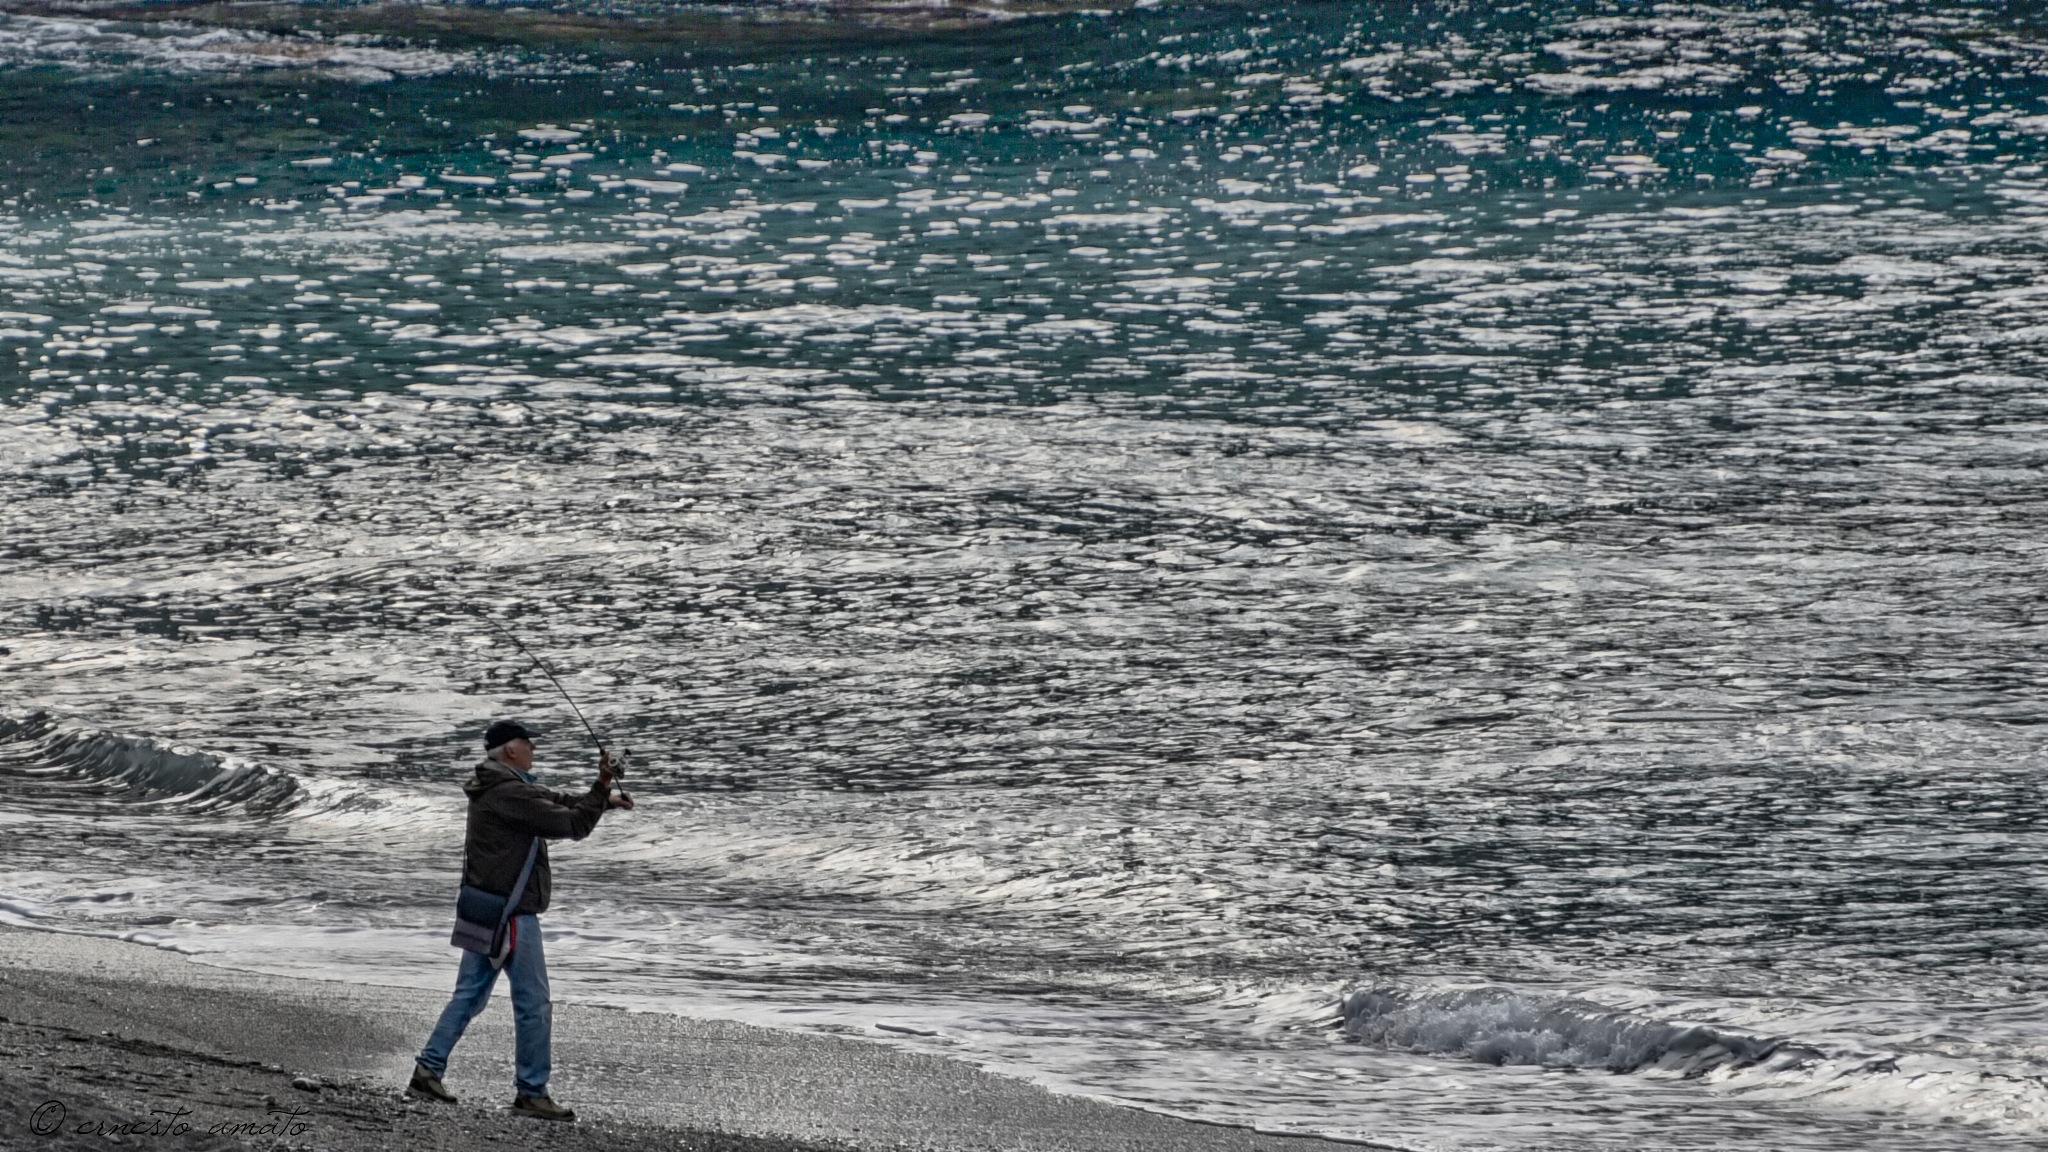 fishing rod launch by ernesto amato